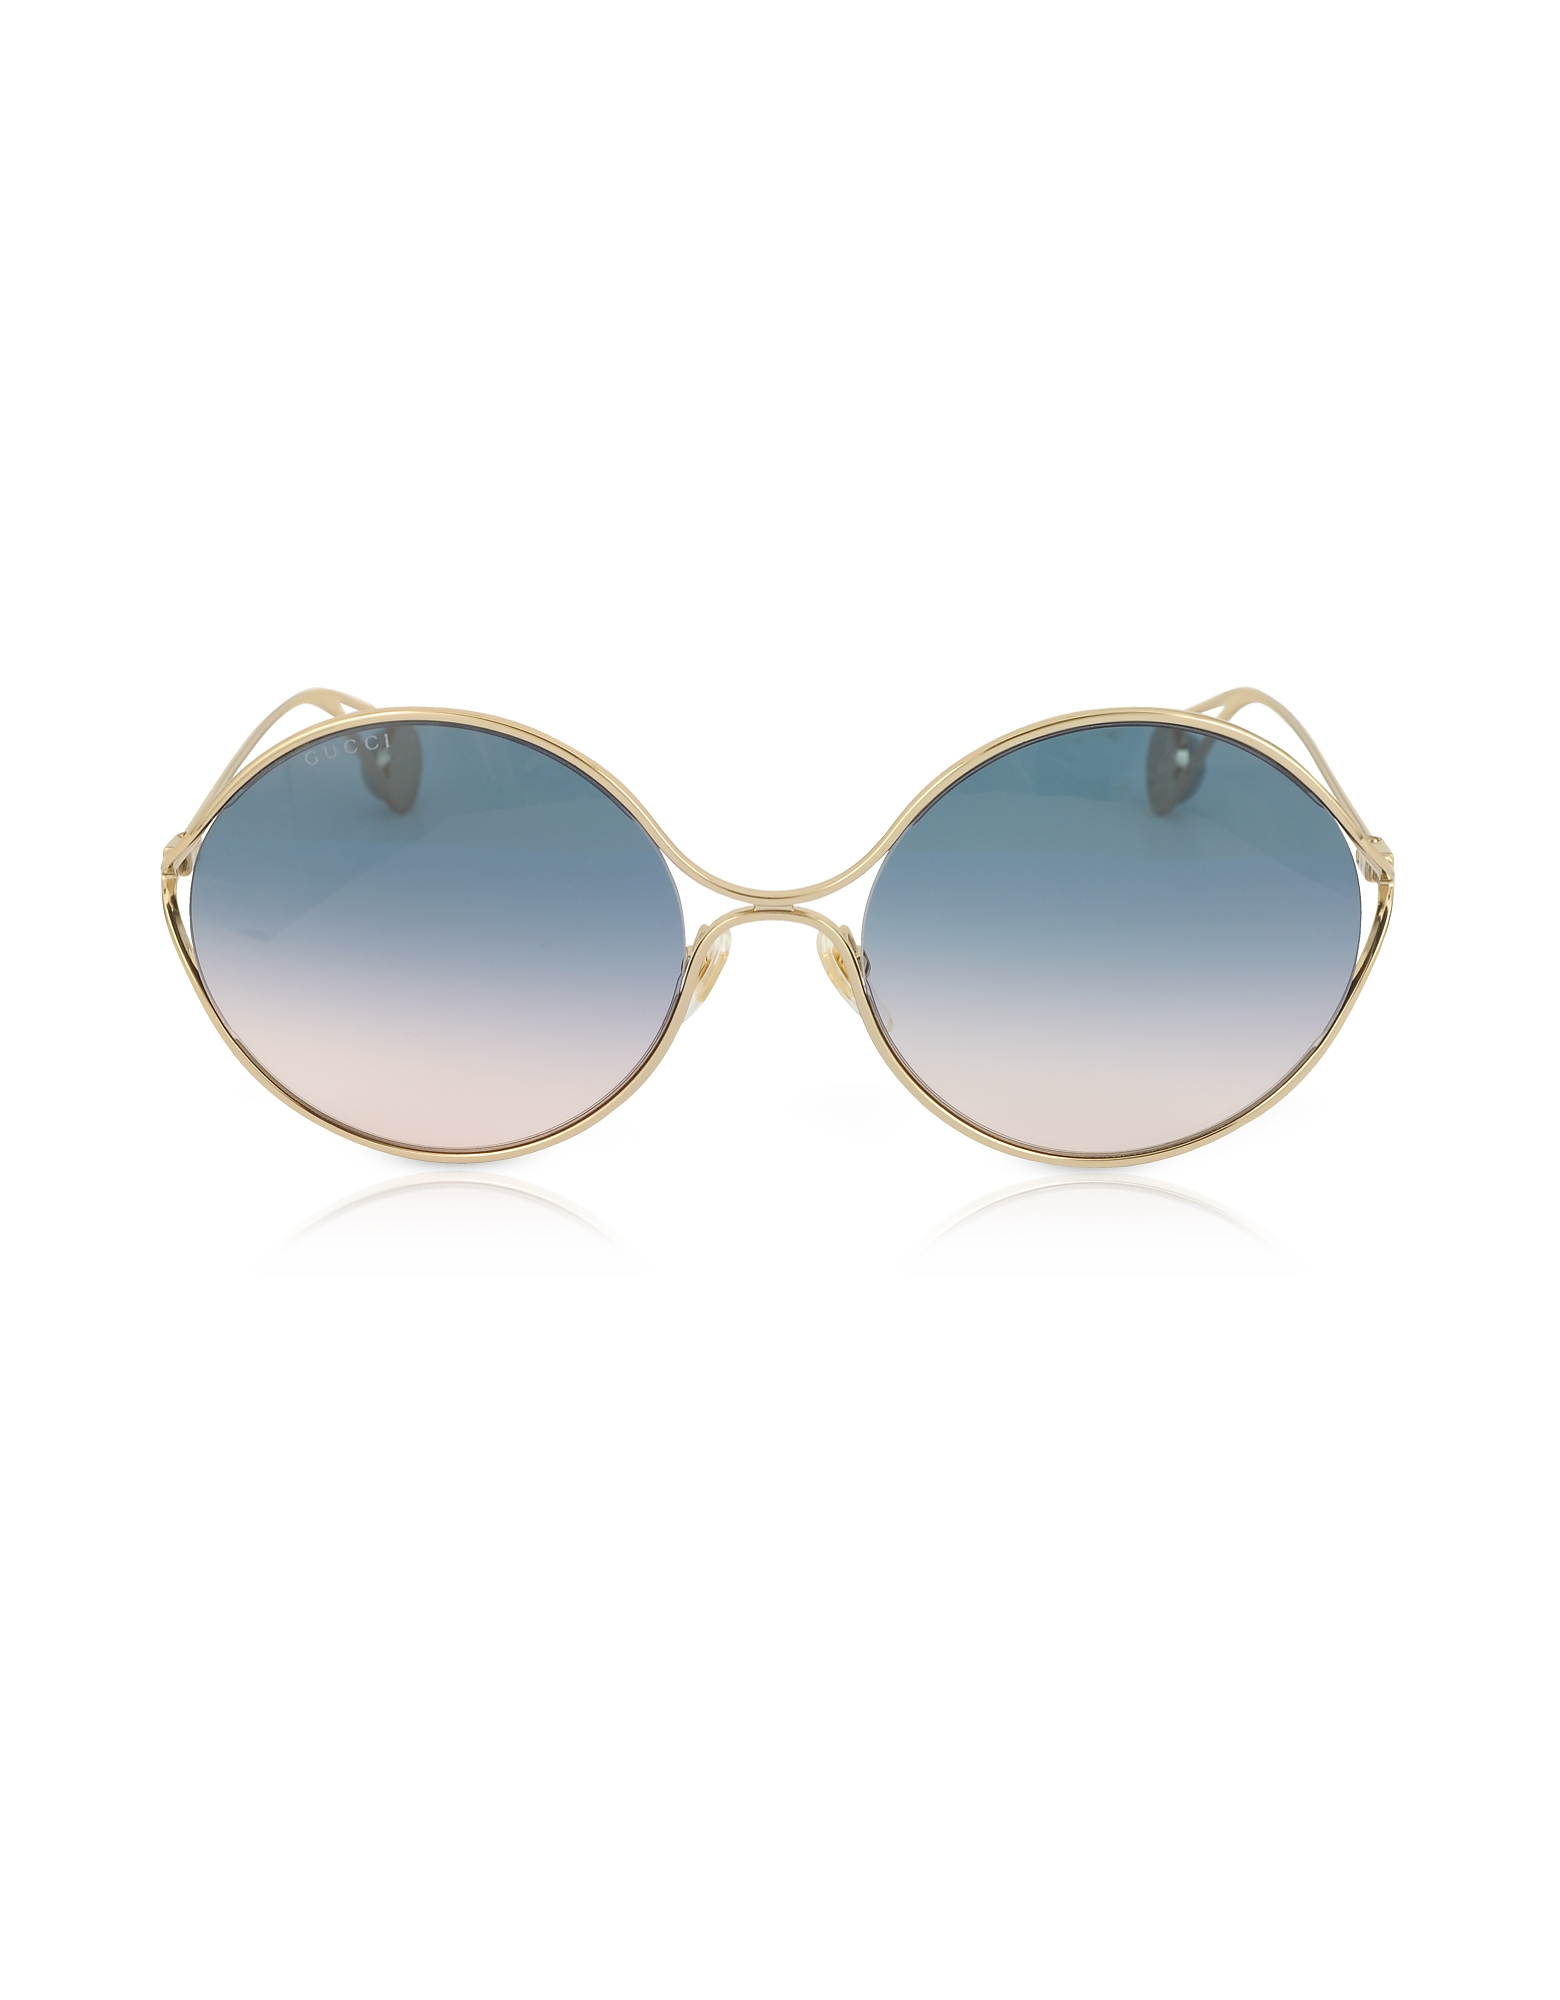 Gucci Sunglasses, GG0253S Round-frame Metal Sunglasses w/GG Pearls